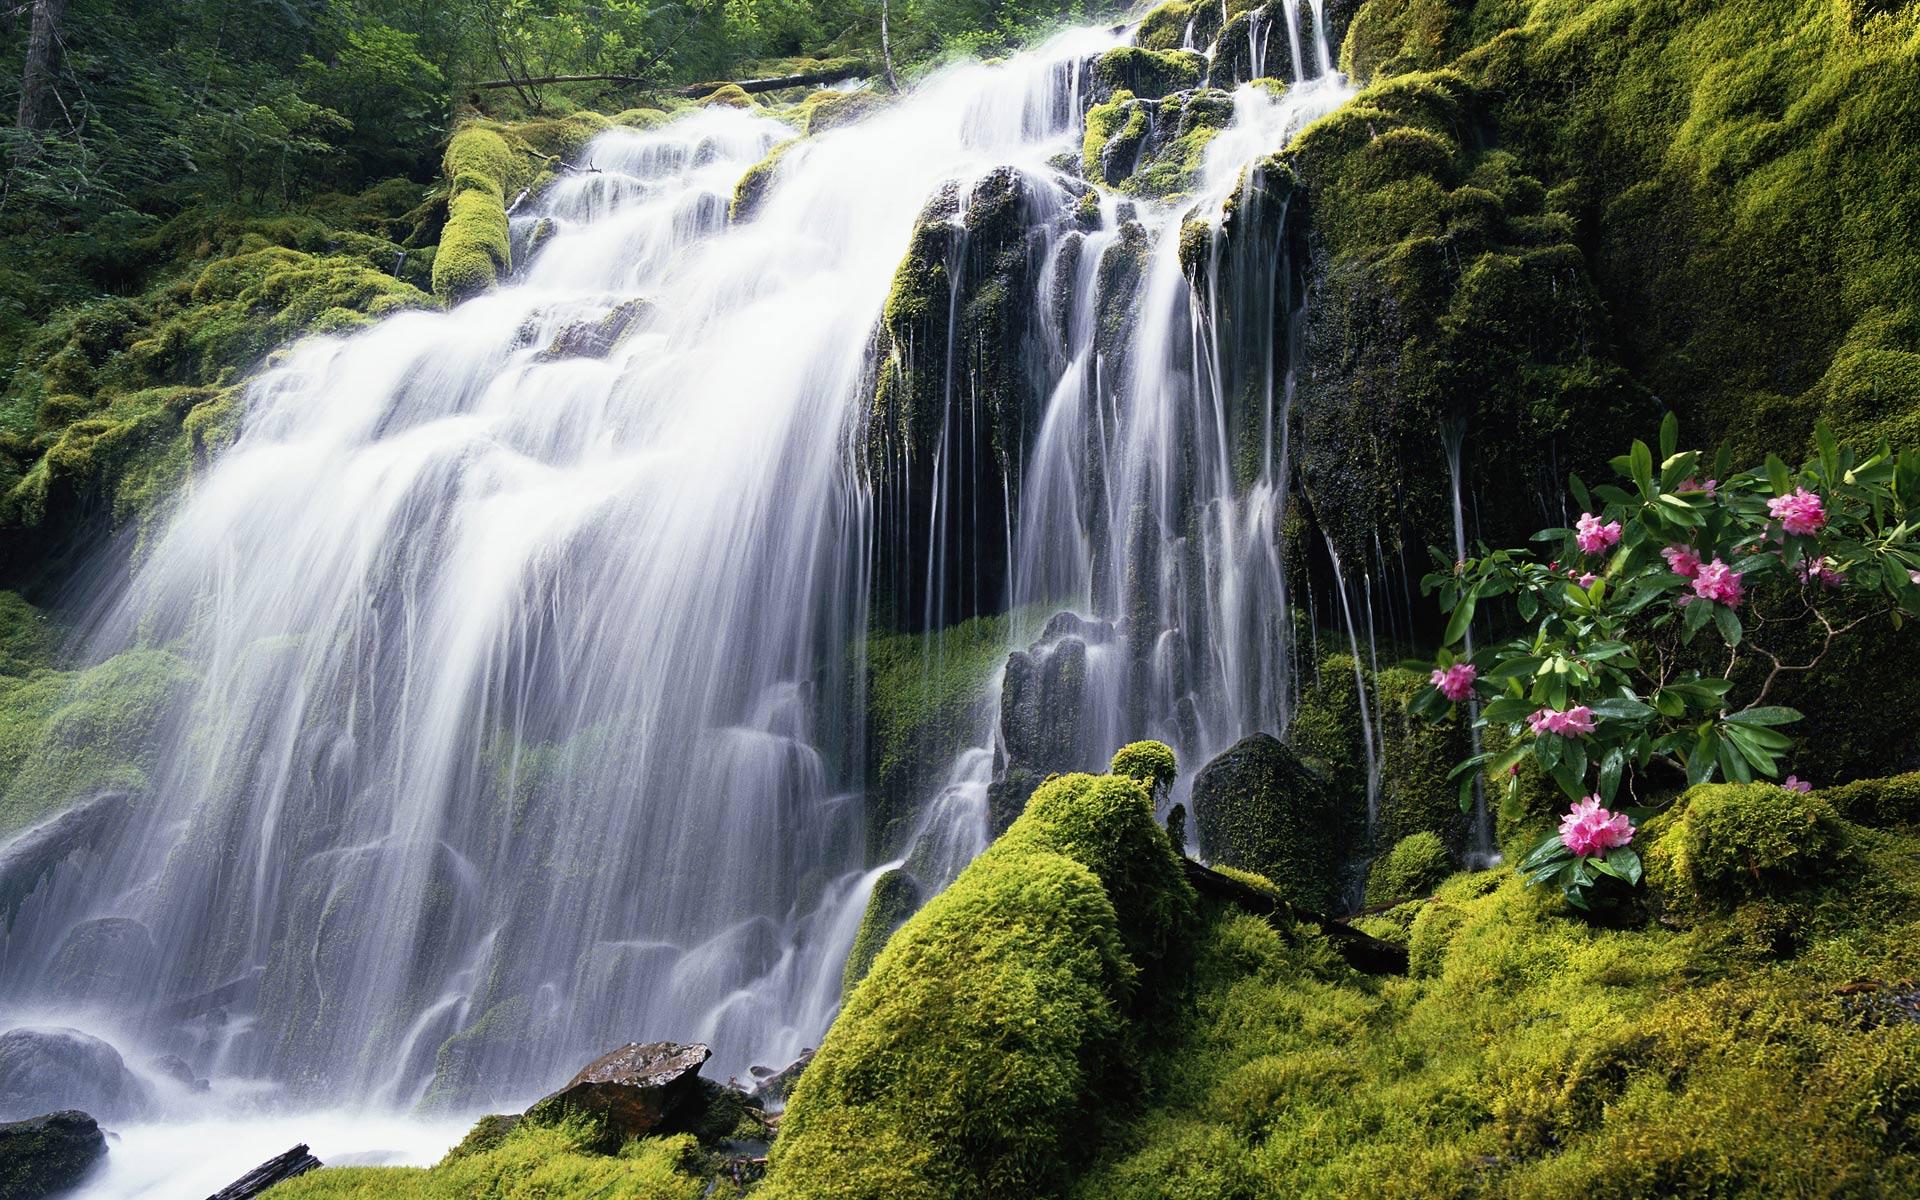 Chutes d'eau,cascades